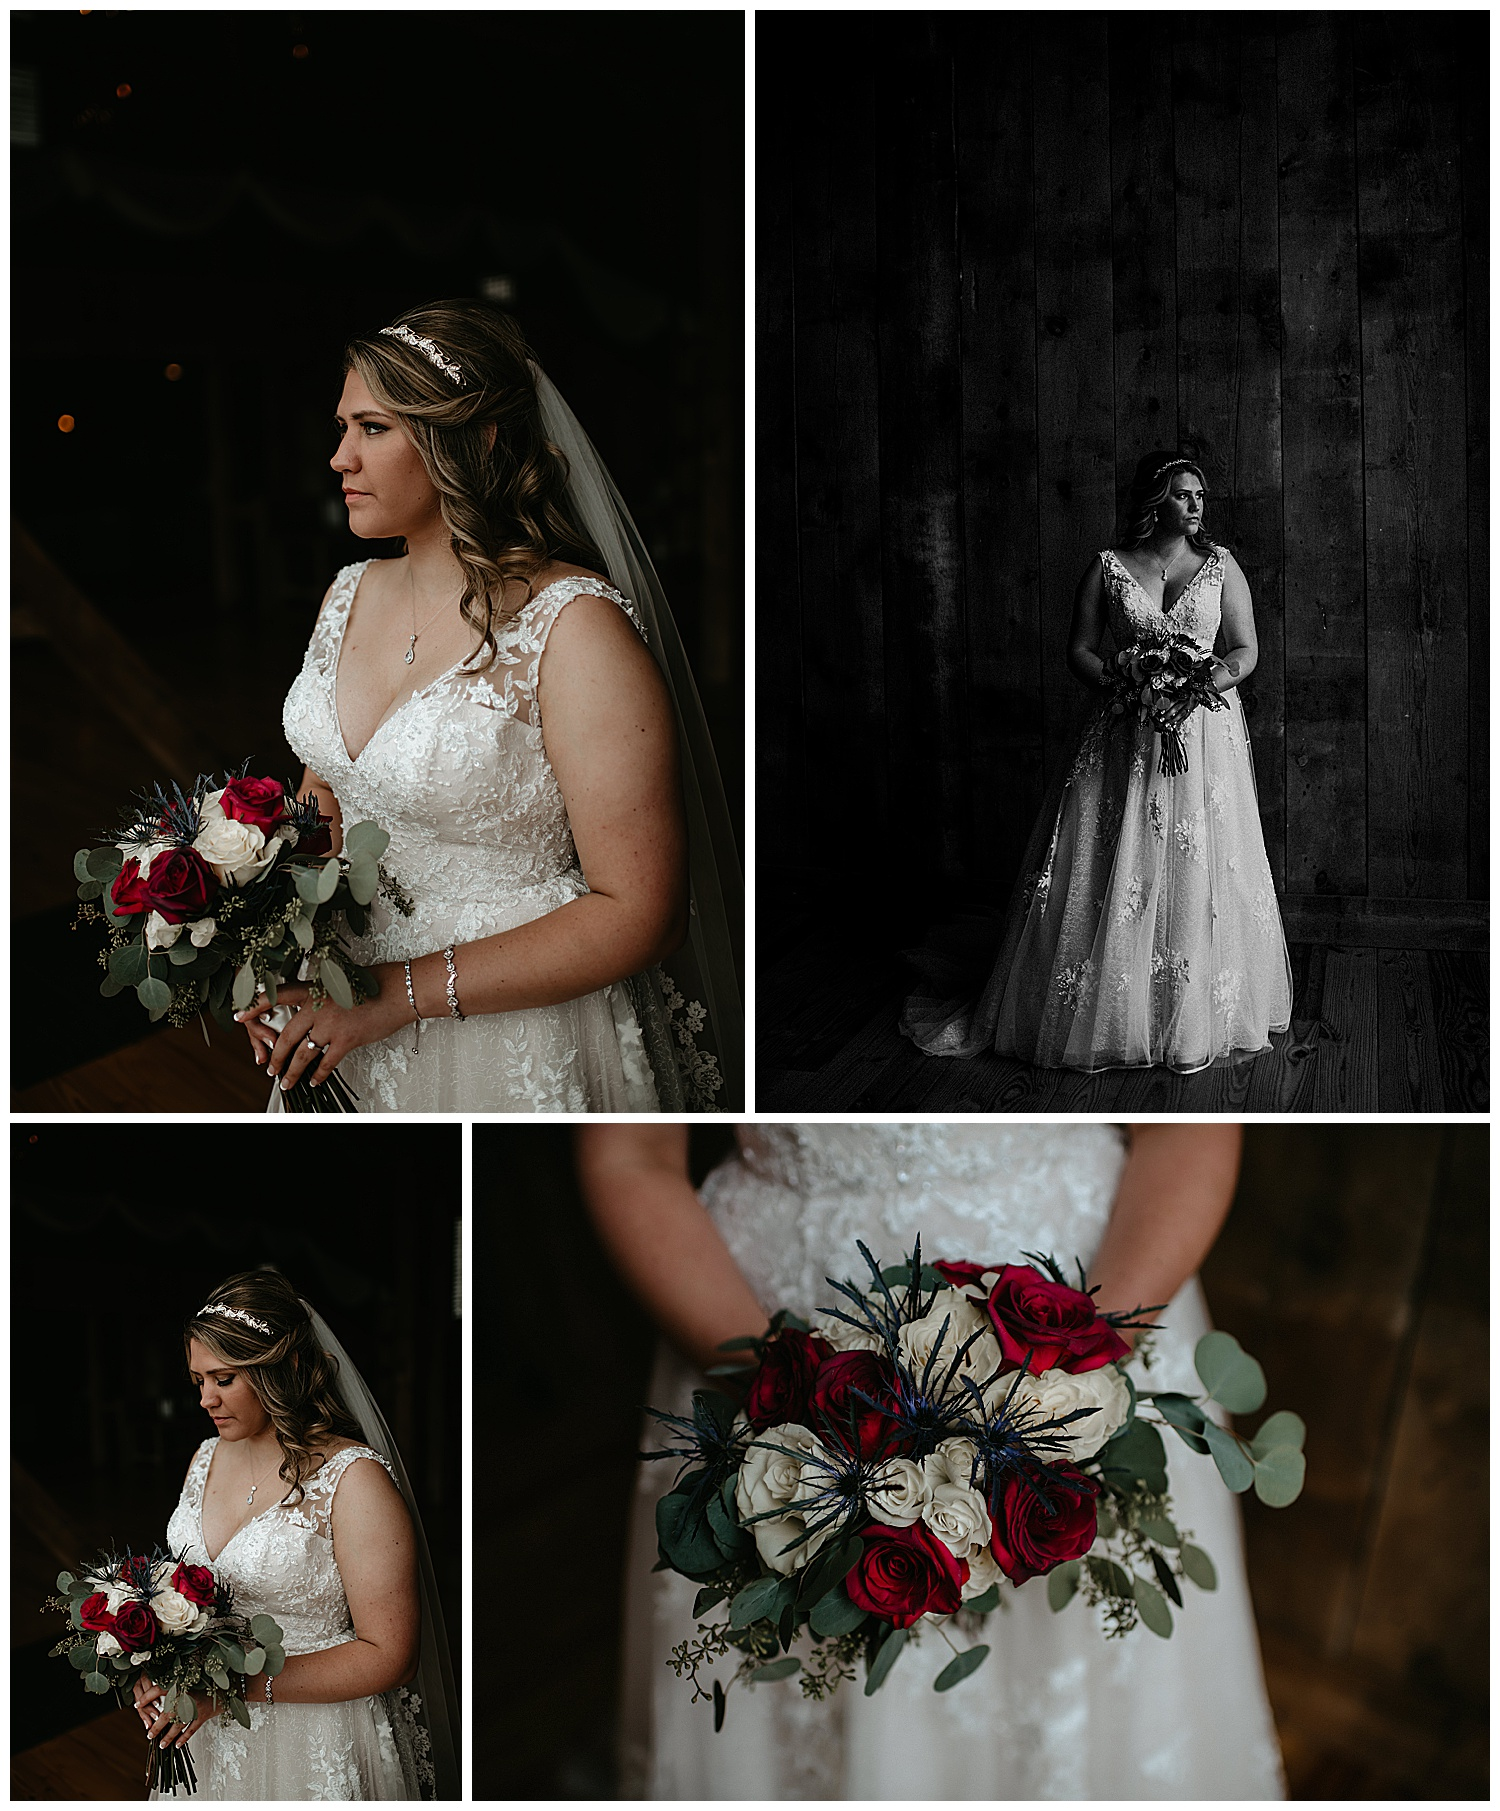 NEPA-Bloomgsburg-Wedding-Photographer-at-The-Barn-at-Greystone-Farms-Watsontown-PA_0022.jpg